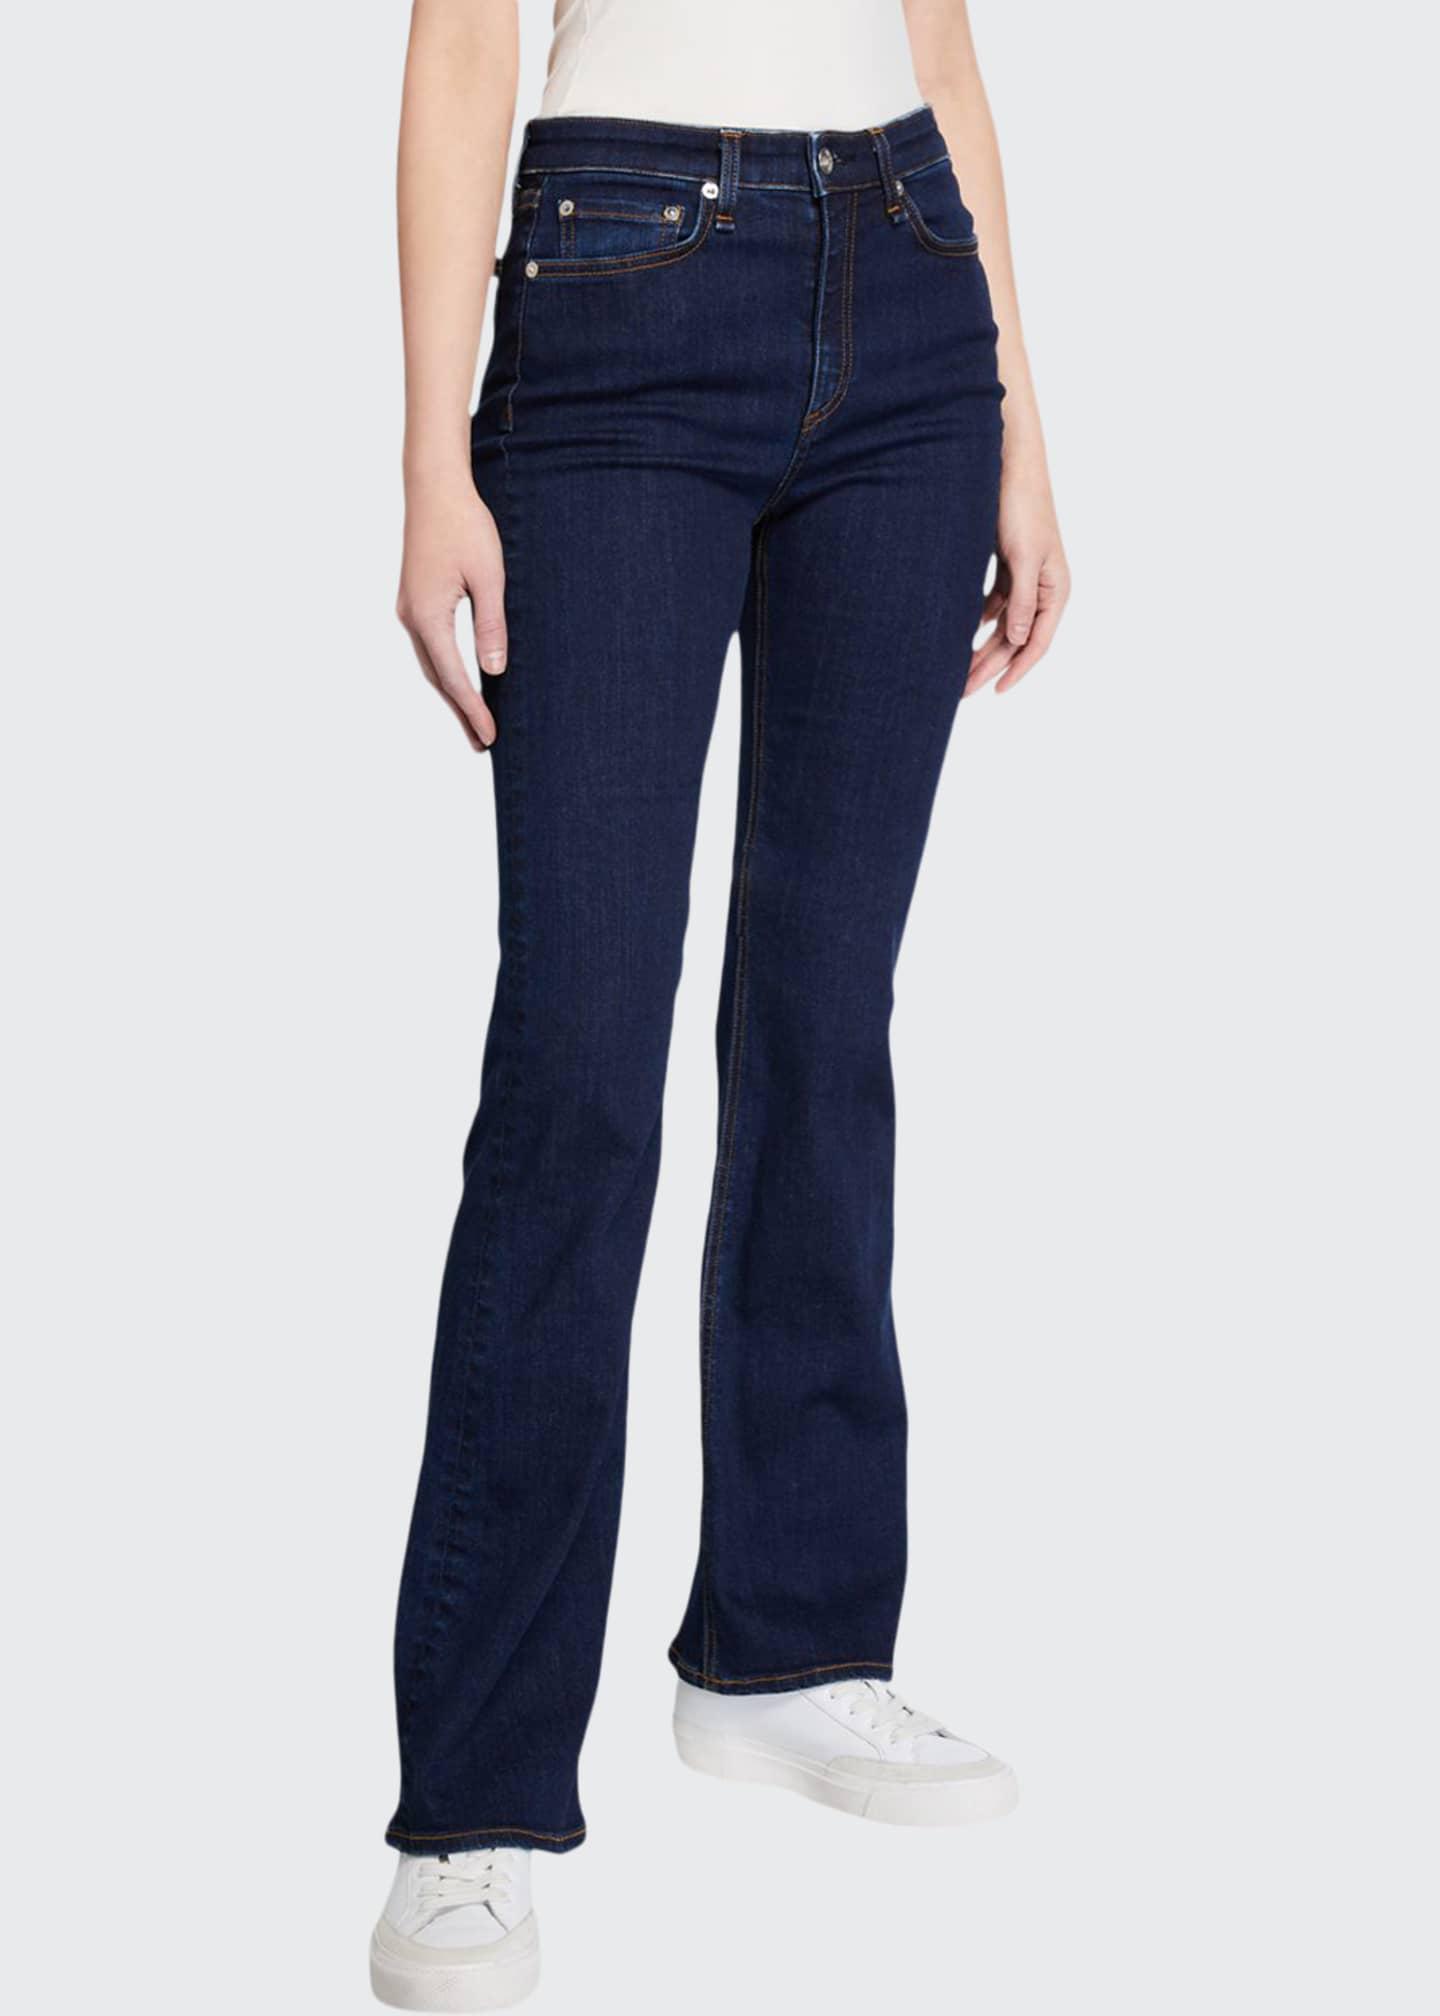 Rag & Bone Nina High-Rise Boot-Cut Denim Jeans